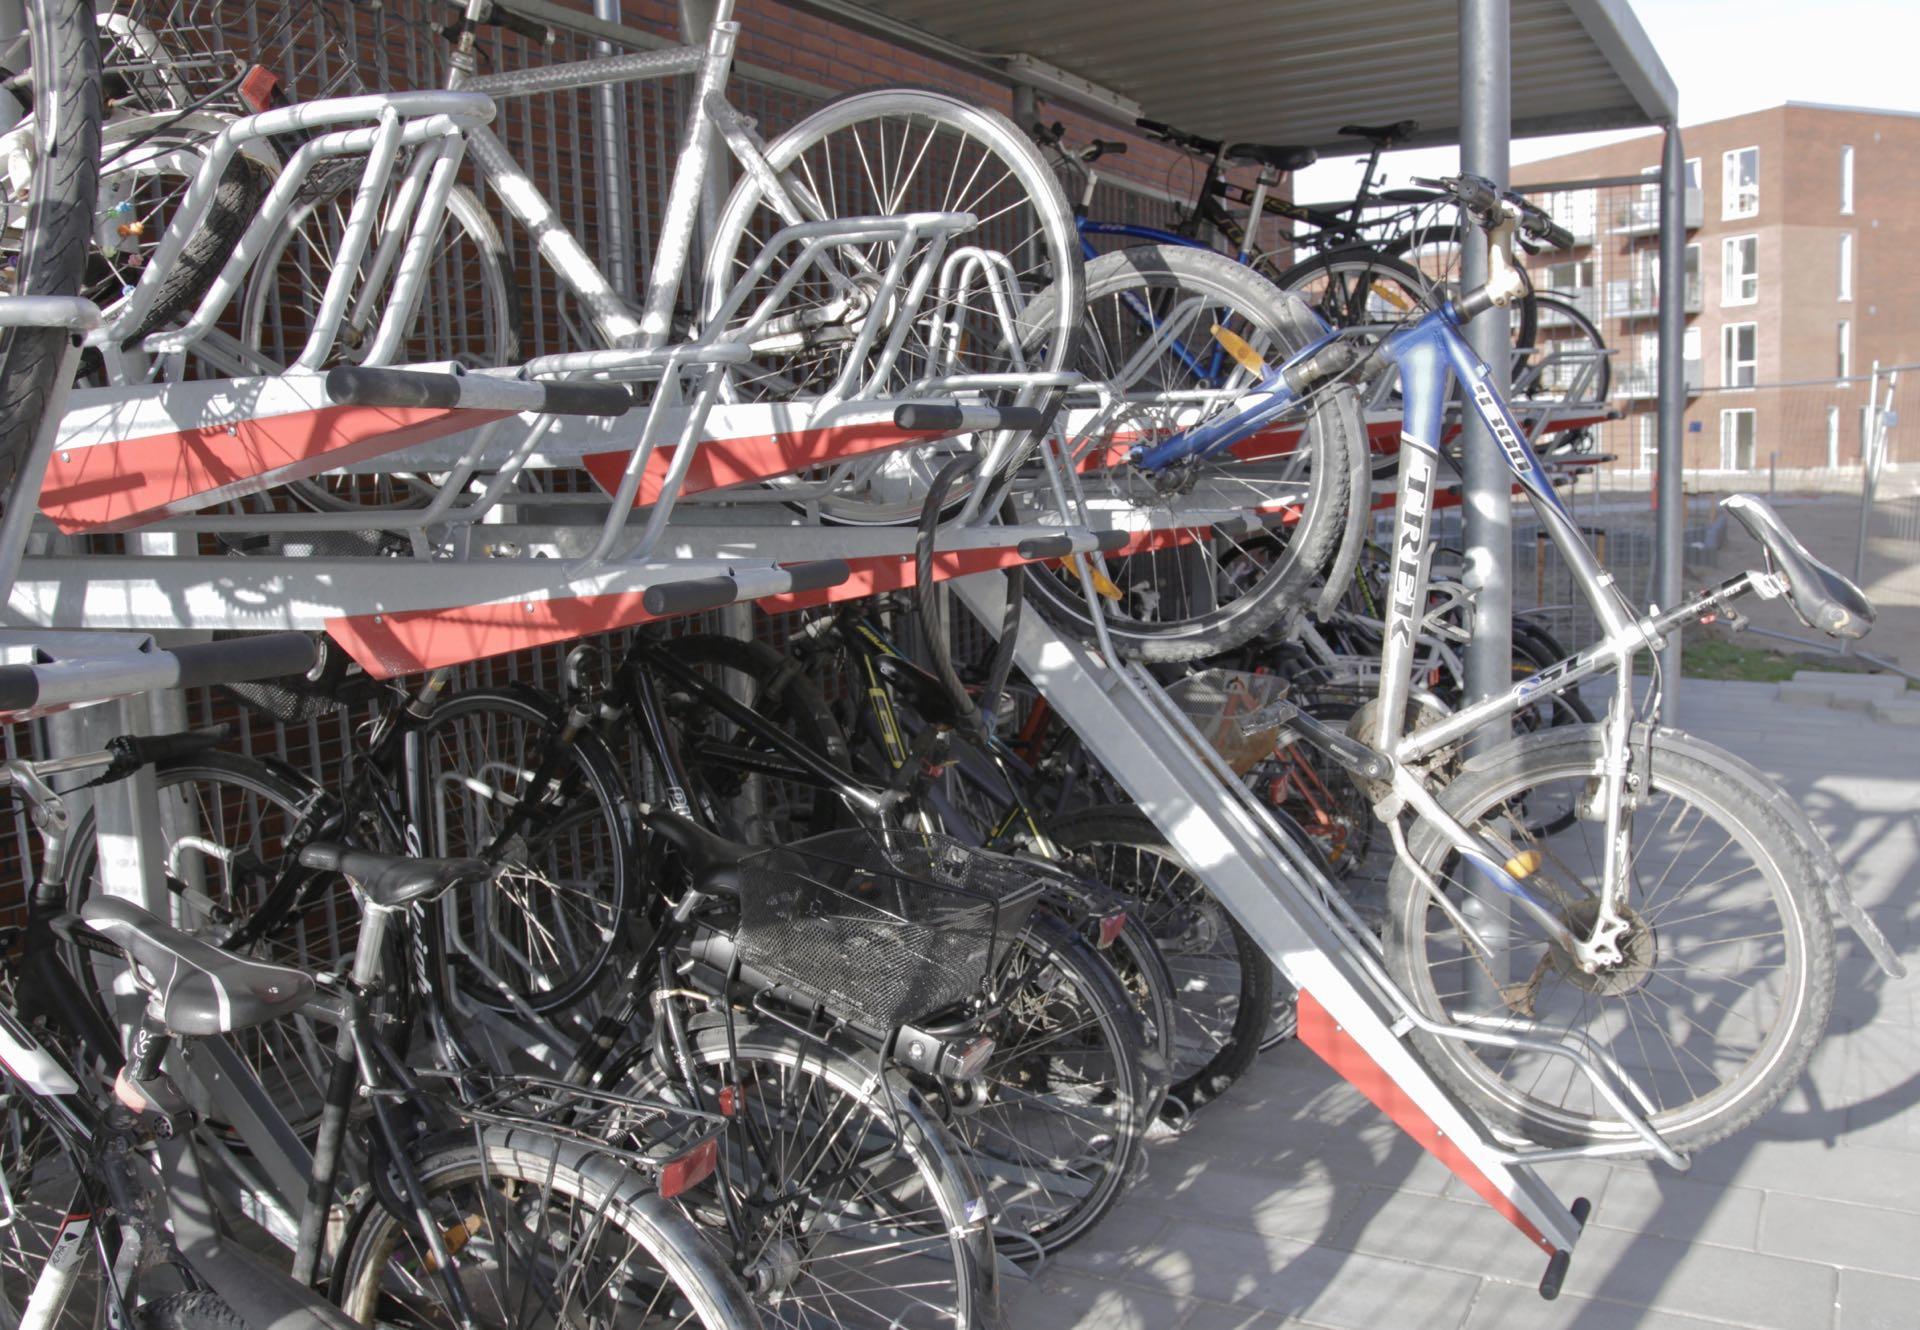 2ParkUp dobbelt cykelstativ under Y cykelskur